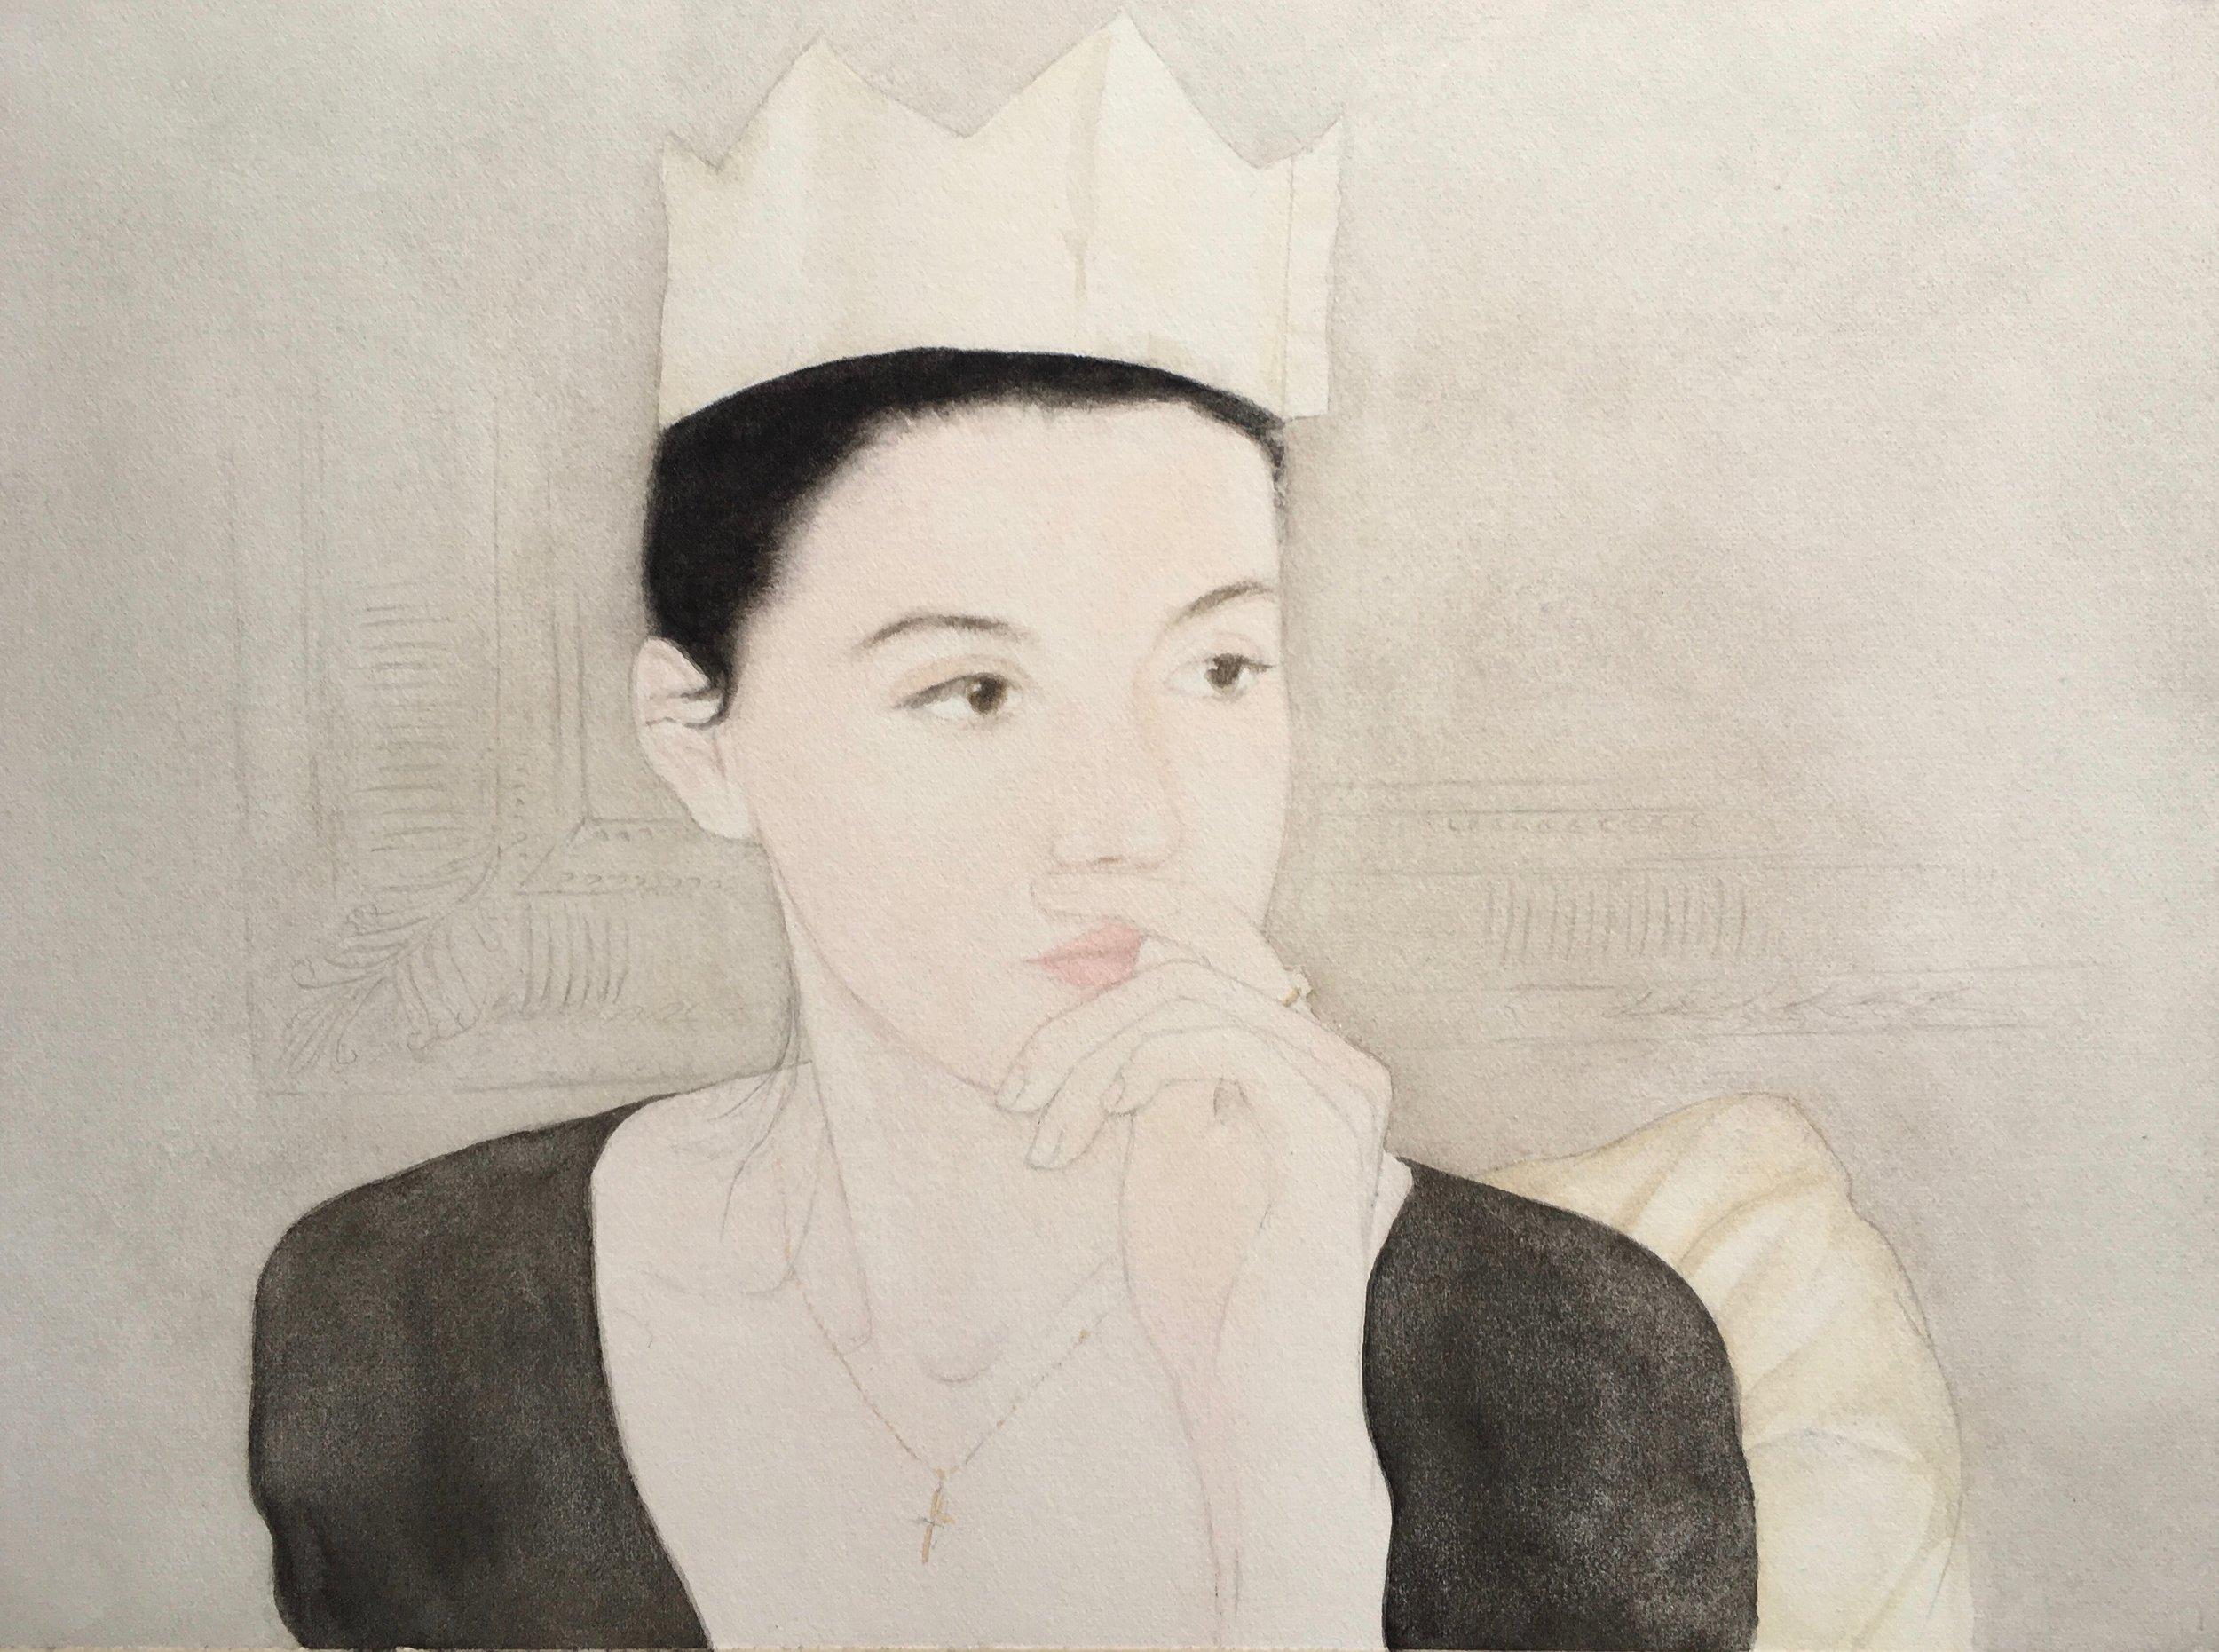 Jo Lynch, Maddy, Christmas Day, Watercolour on Paper, 19cm x 25.6cm,  http://www.belasdead.com/